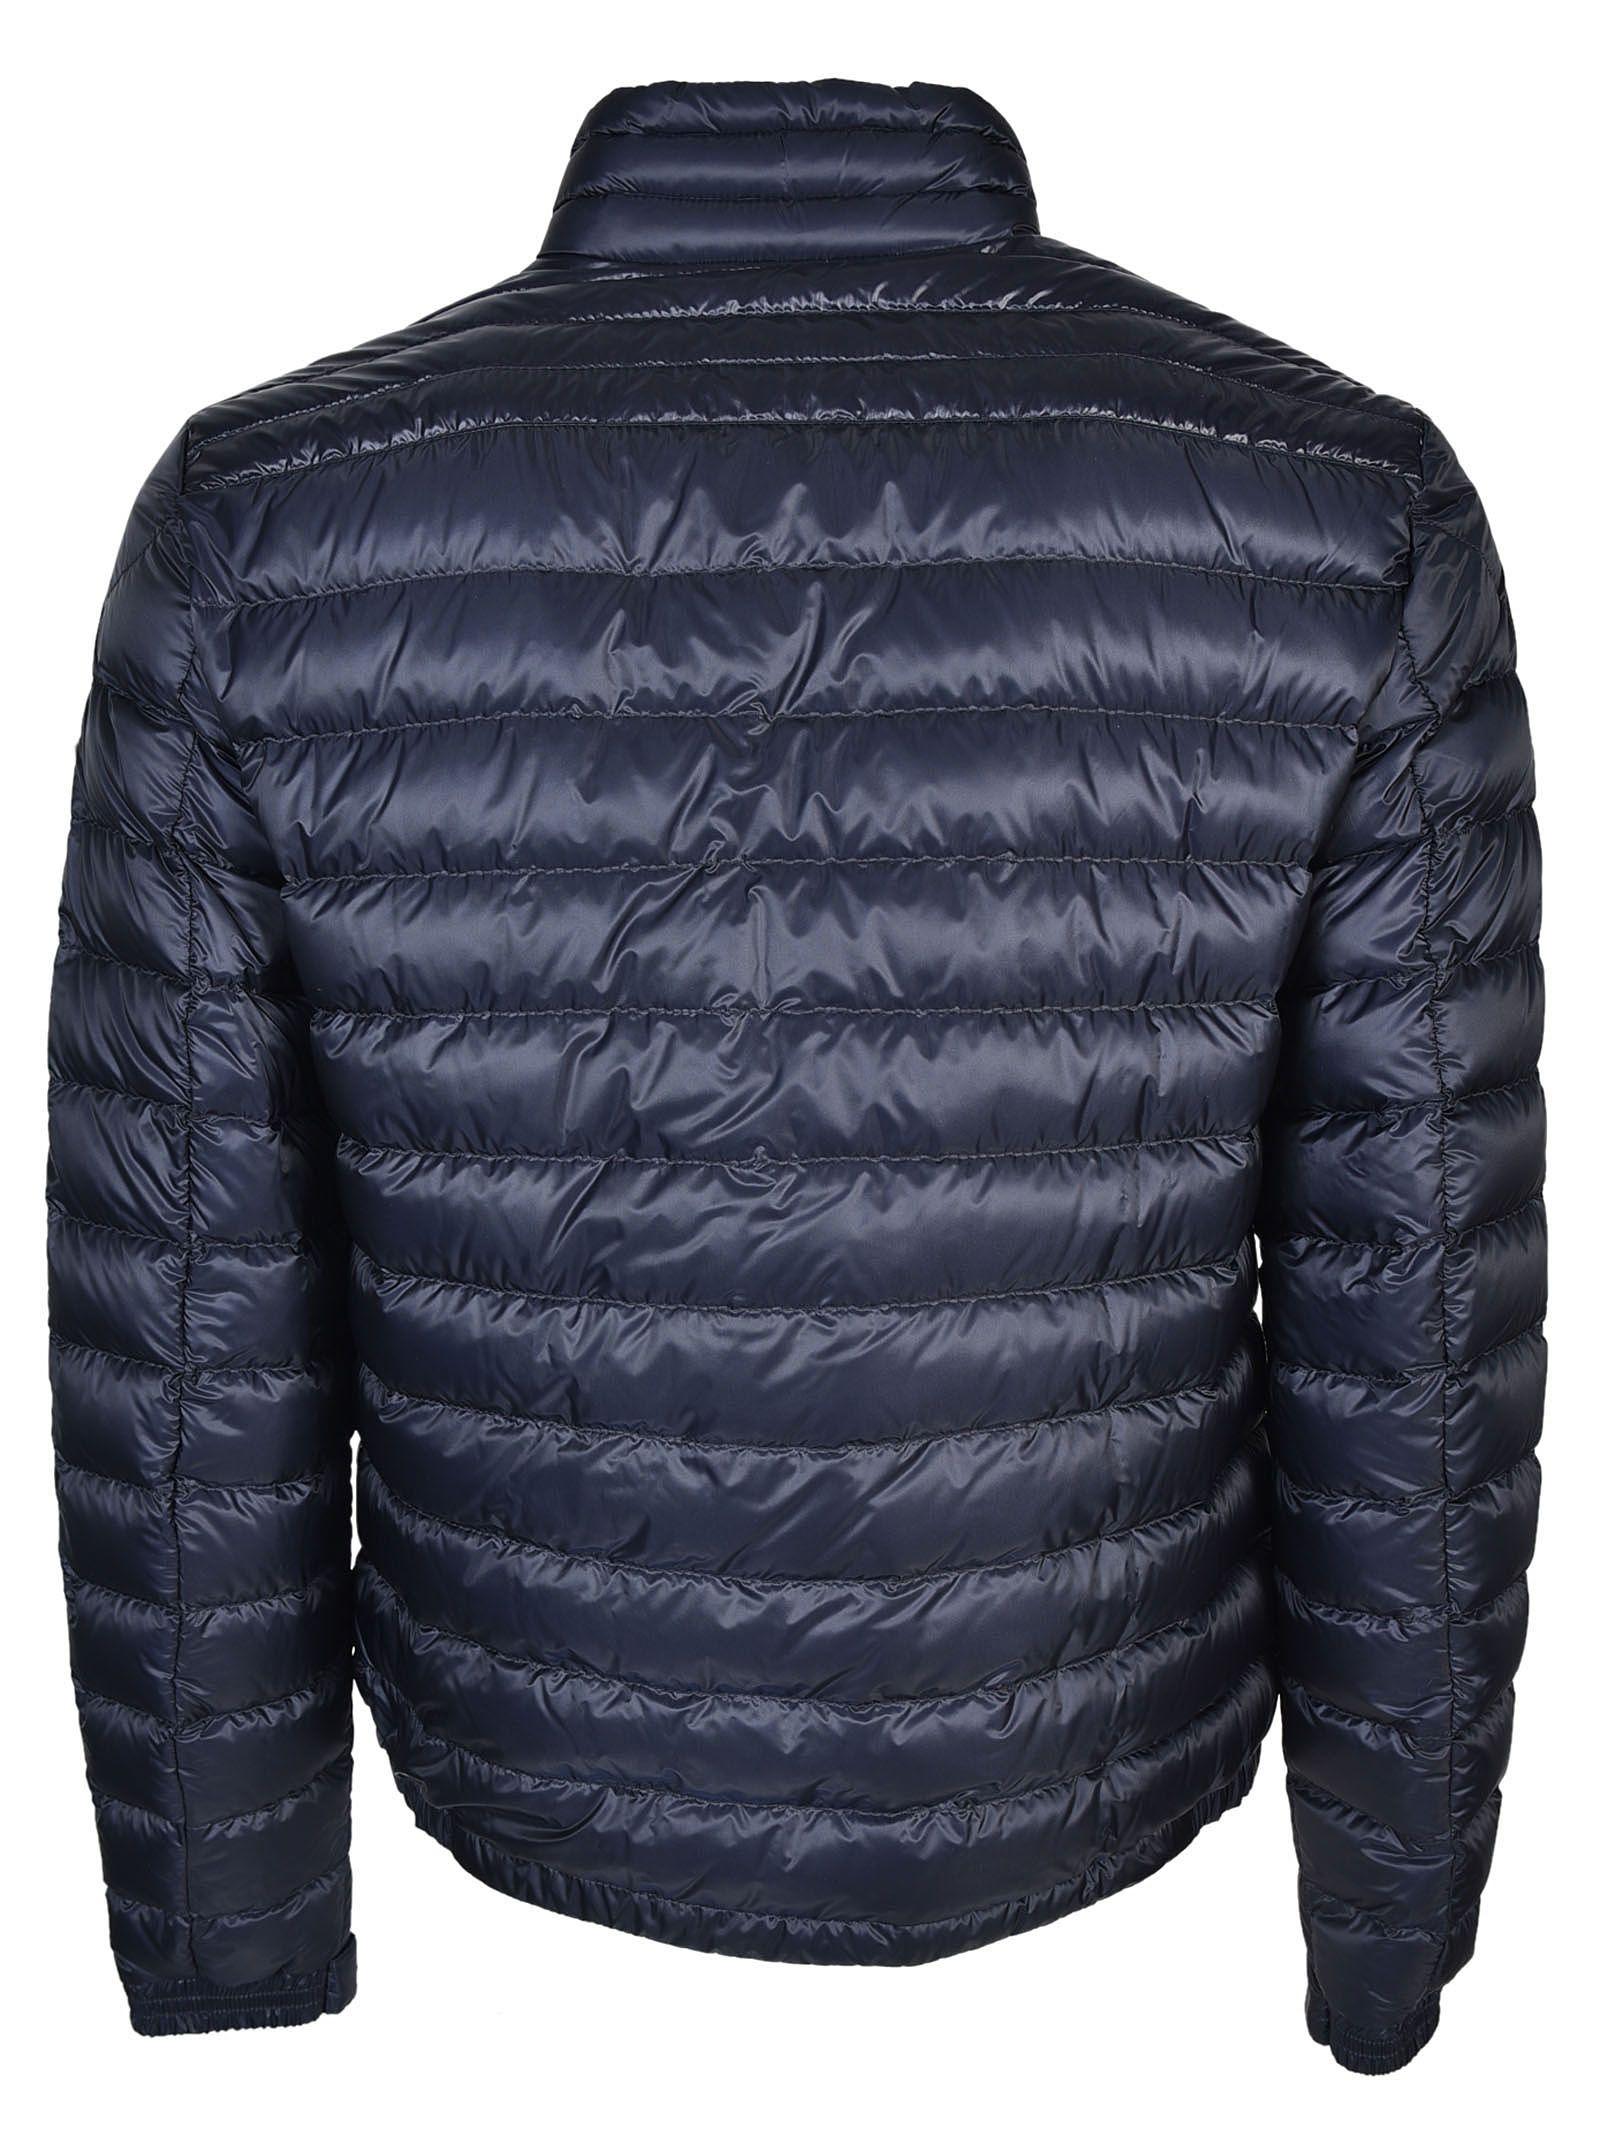 Moncler Daniel Down Jacket - Blue Moncler Daniel Down Jacket - Blue